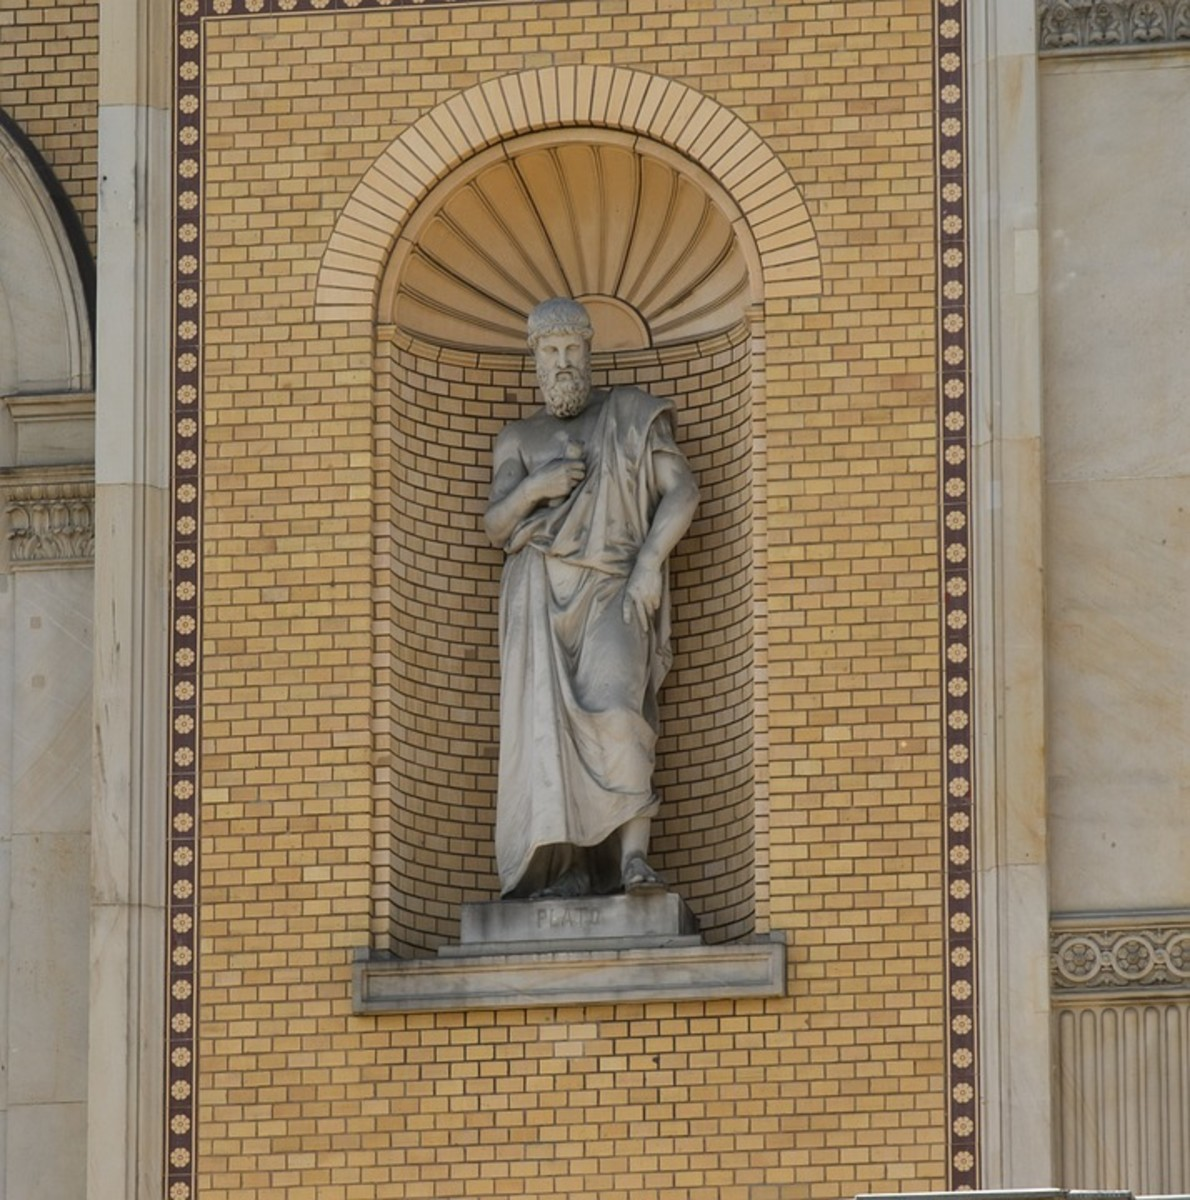 A sculpture of Plato.